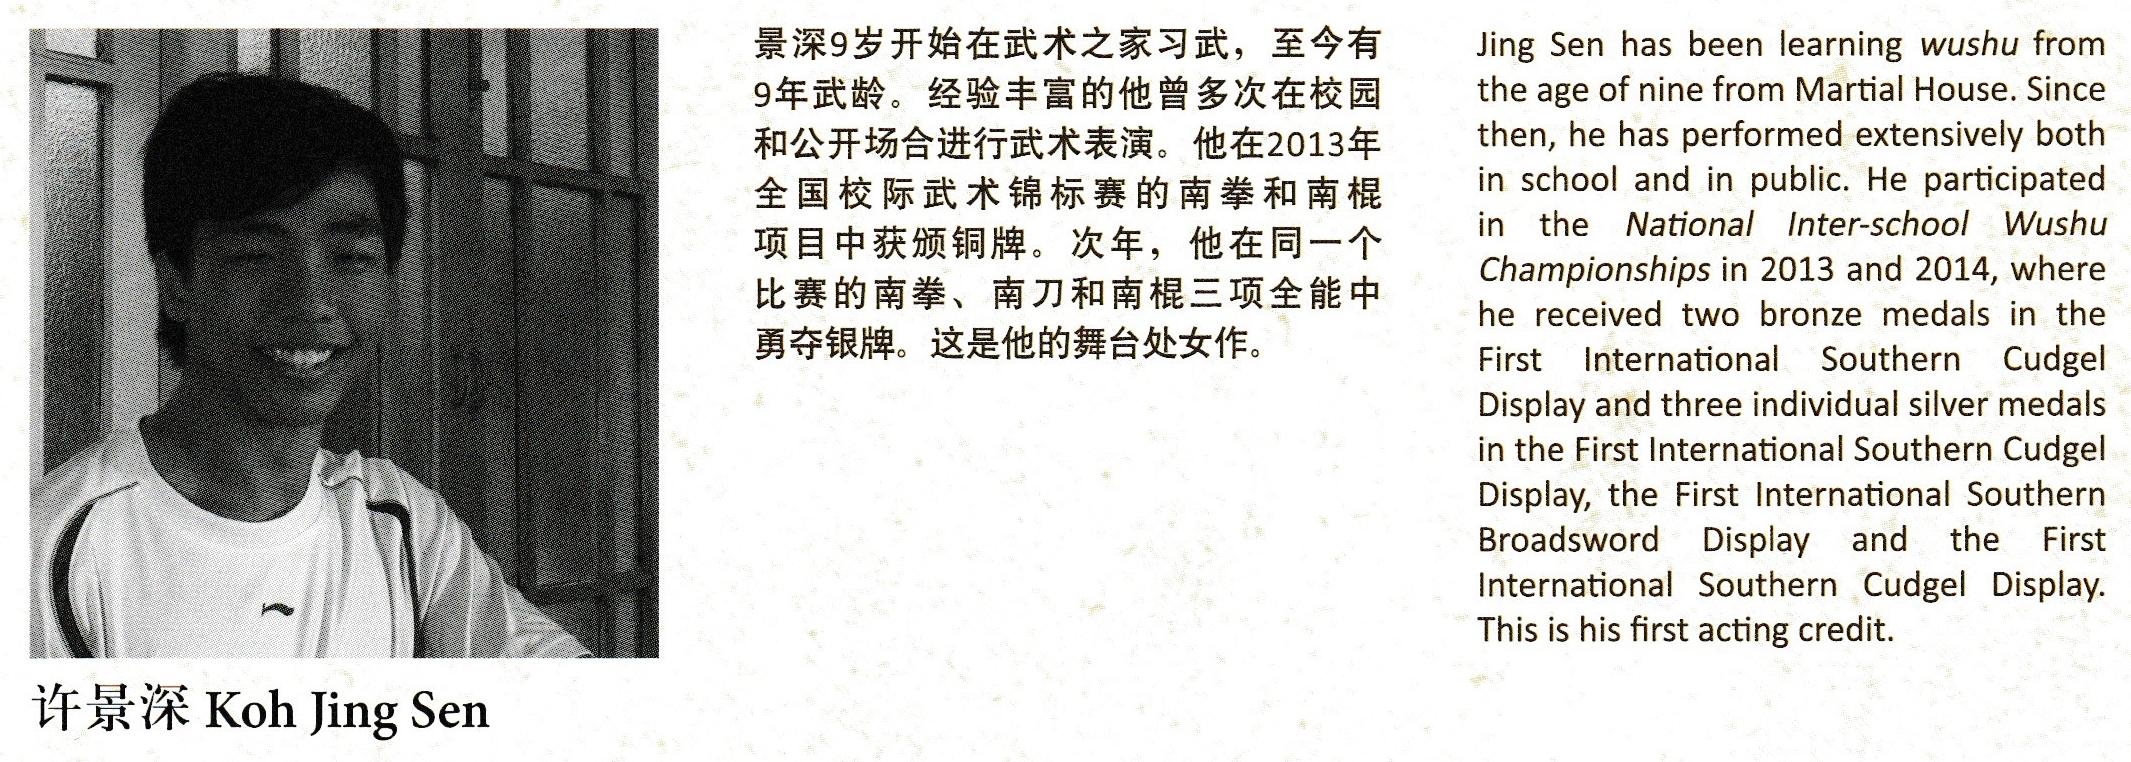 Koh Jing Sen